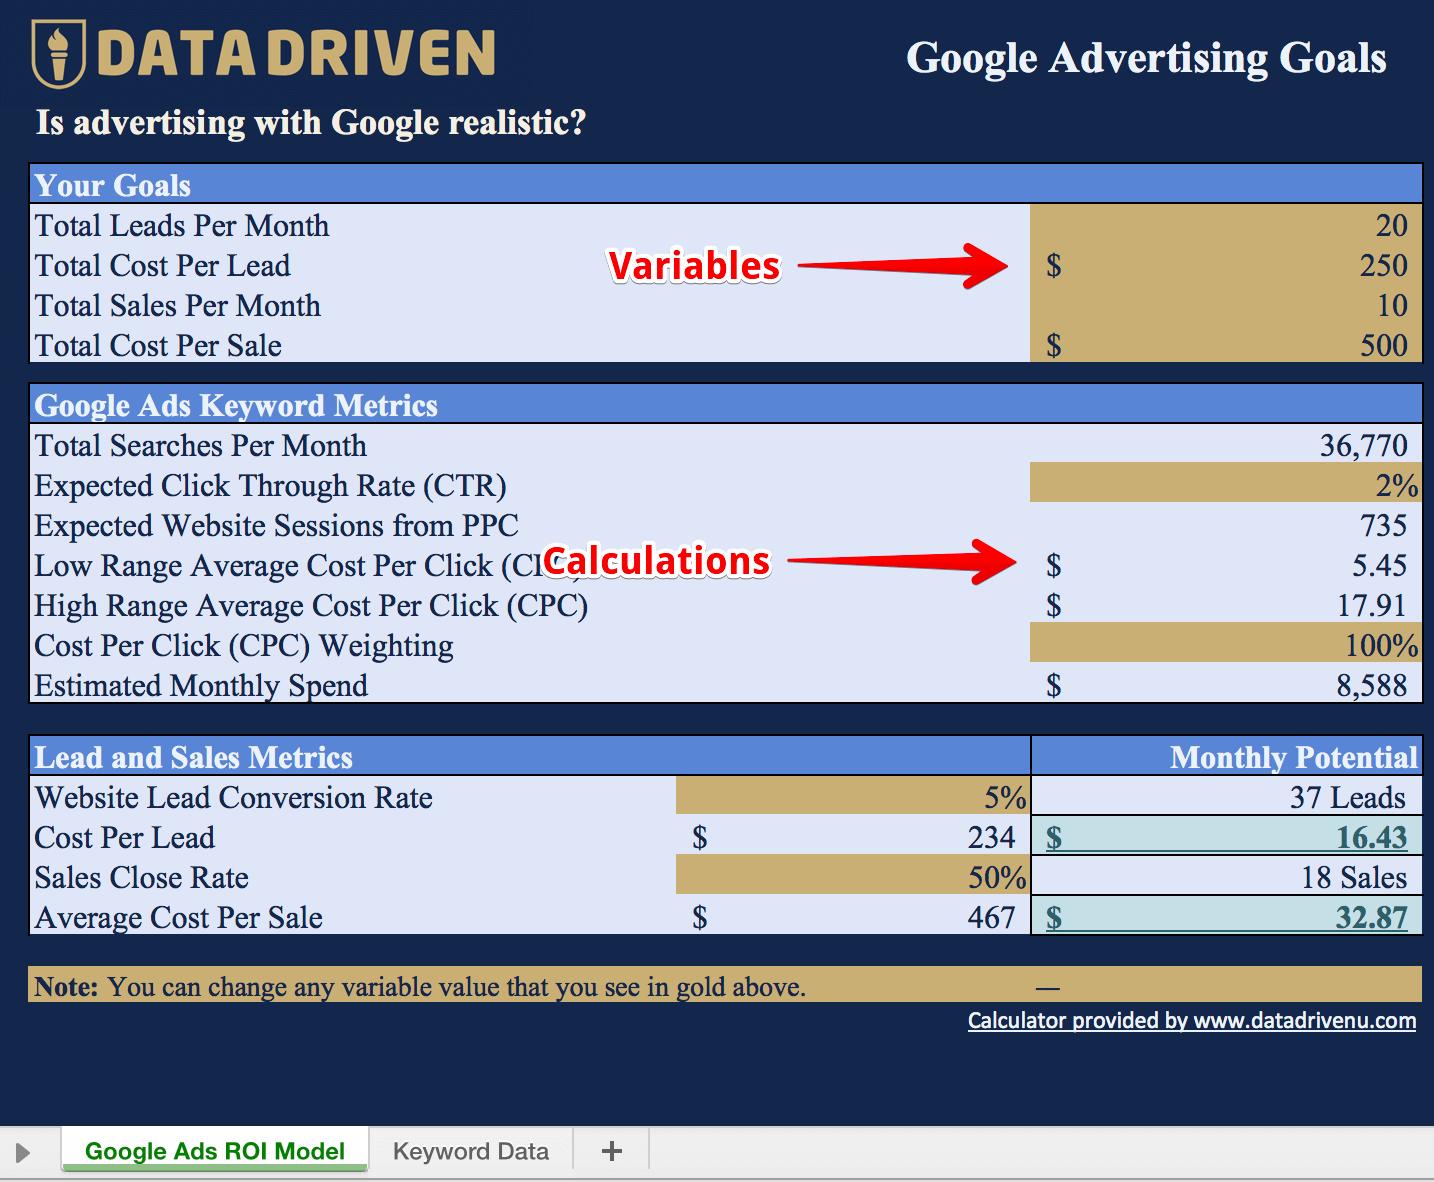 Google Ads ROI Model Variables